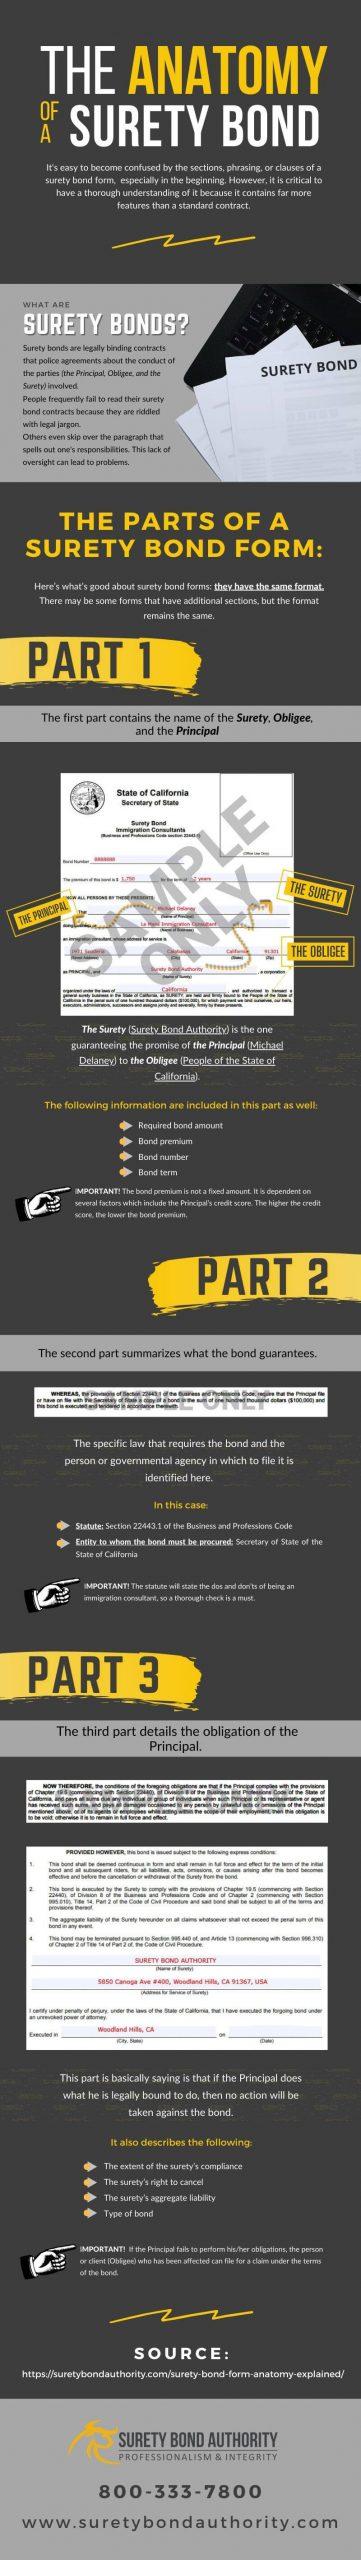 Surety Bond Form Anatomy Infographic